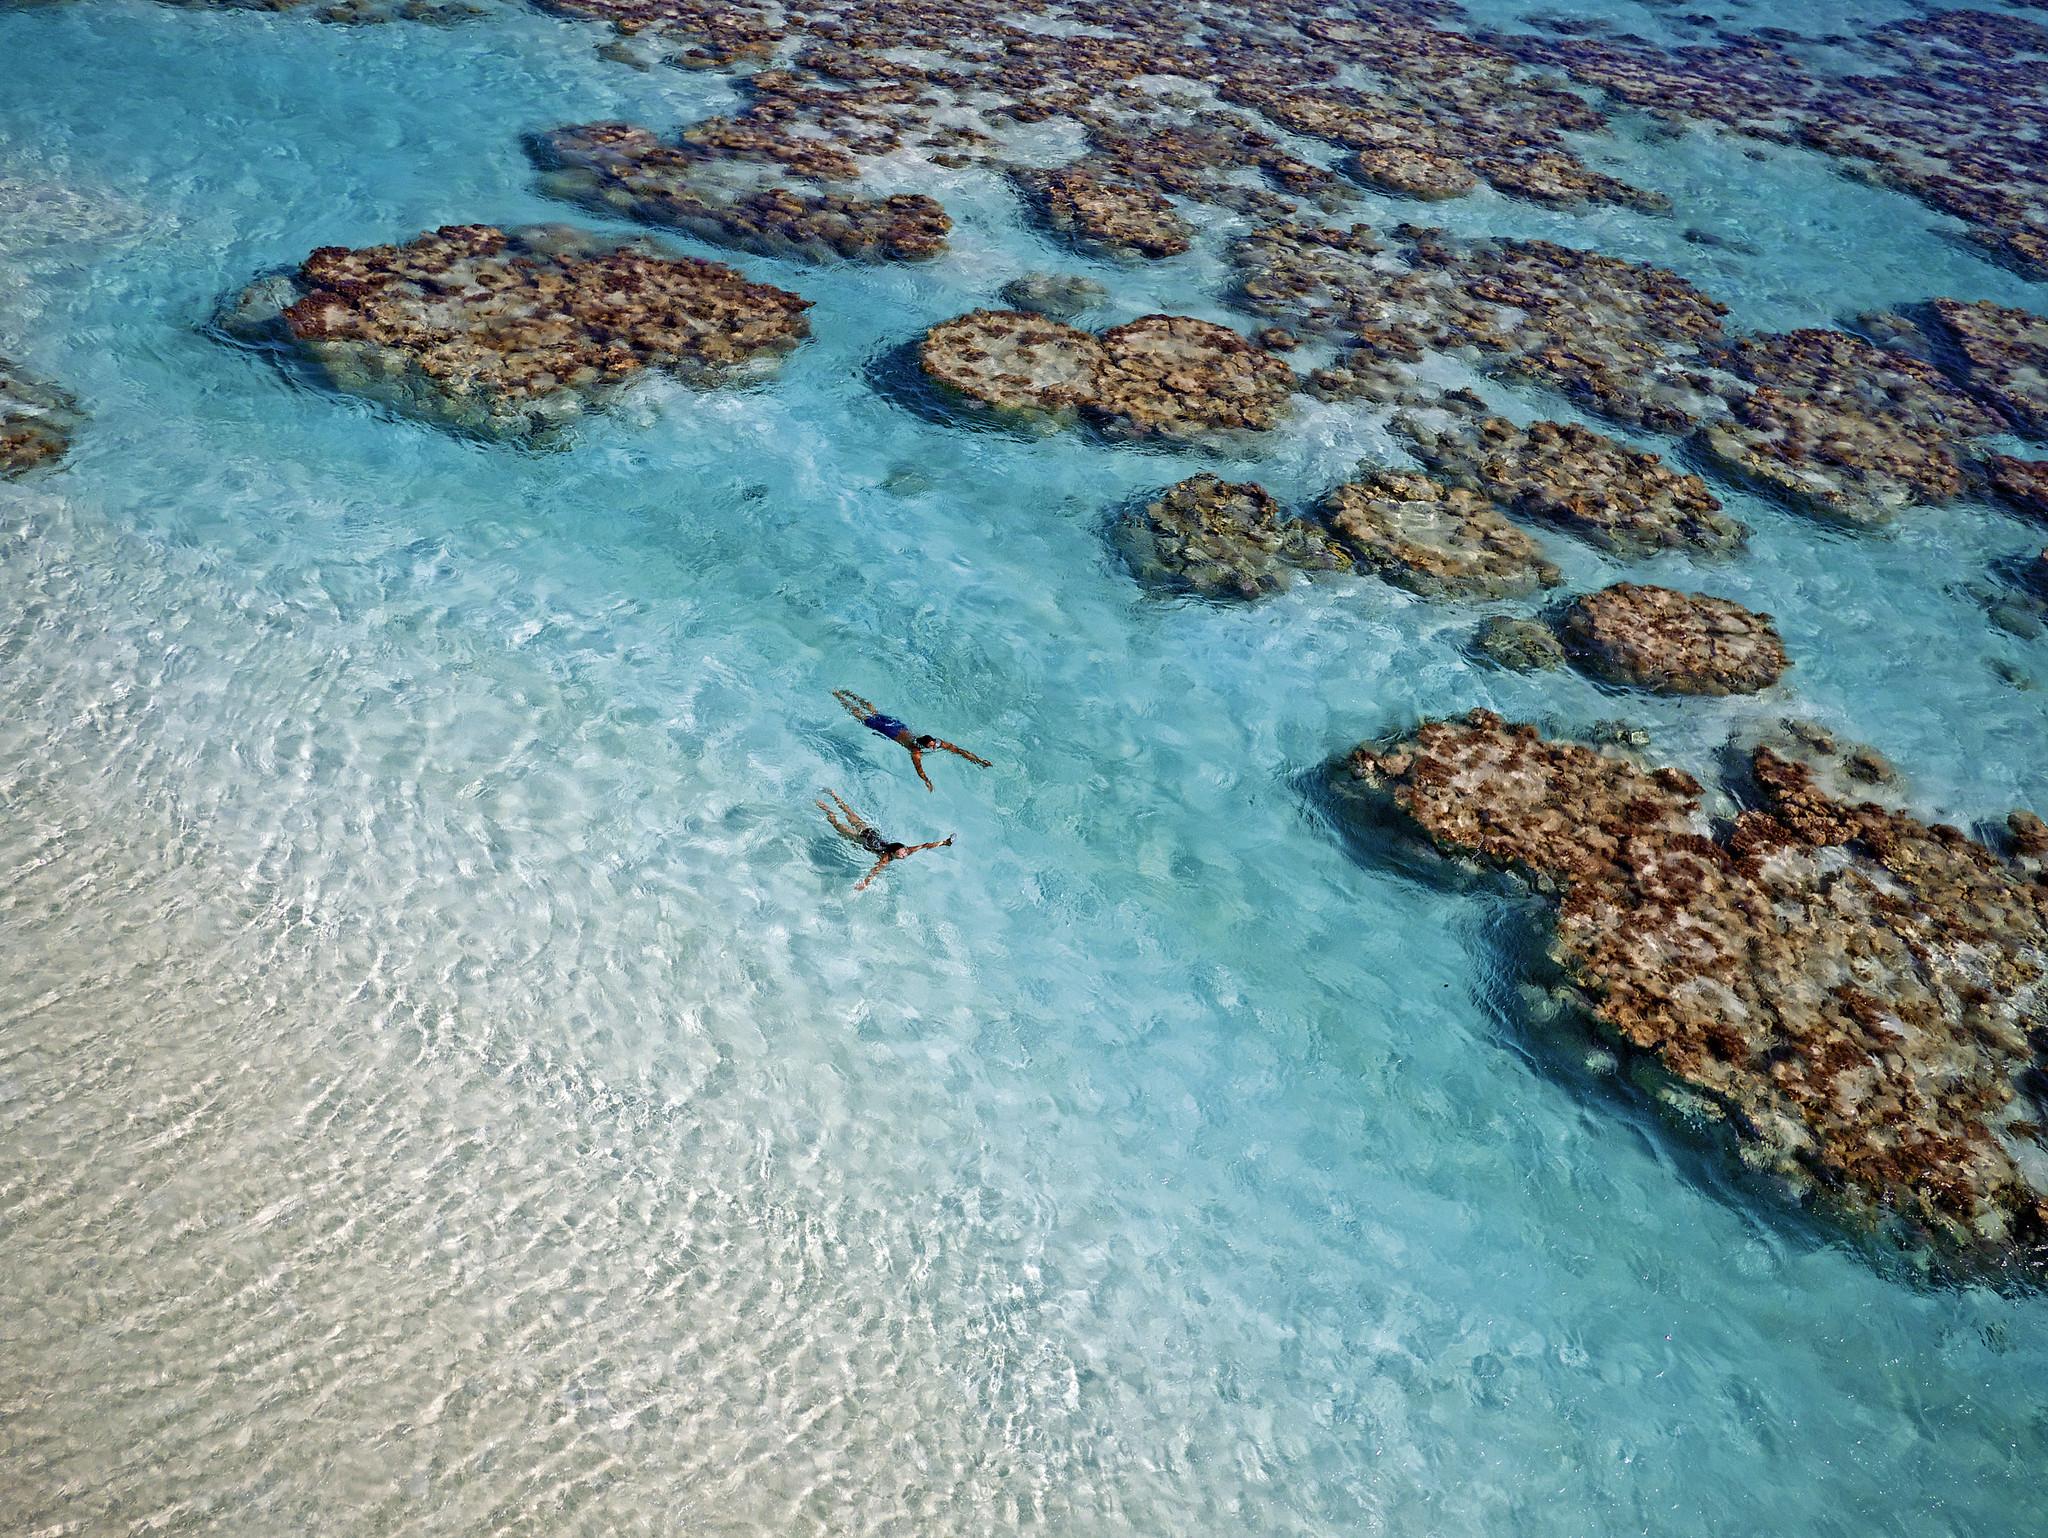 Marlon Brando's island paradise in Tetiaroa, French Polynesia